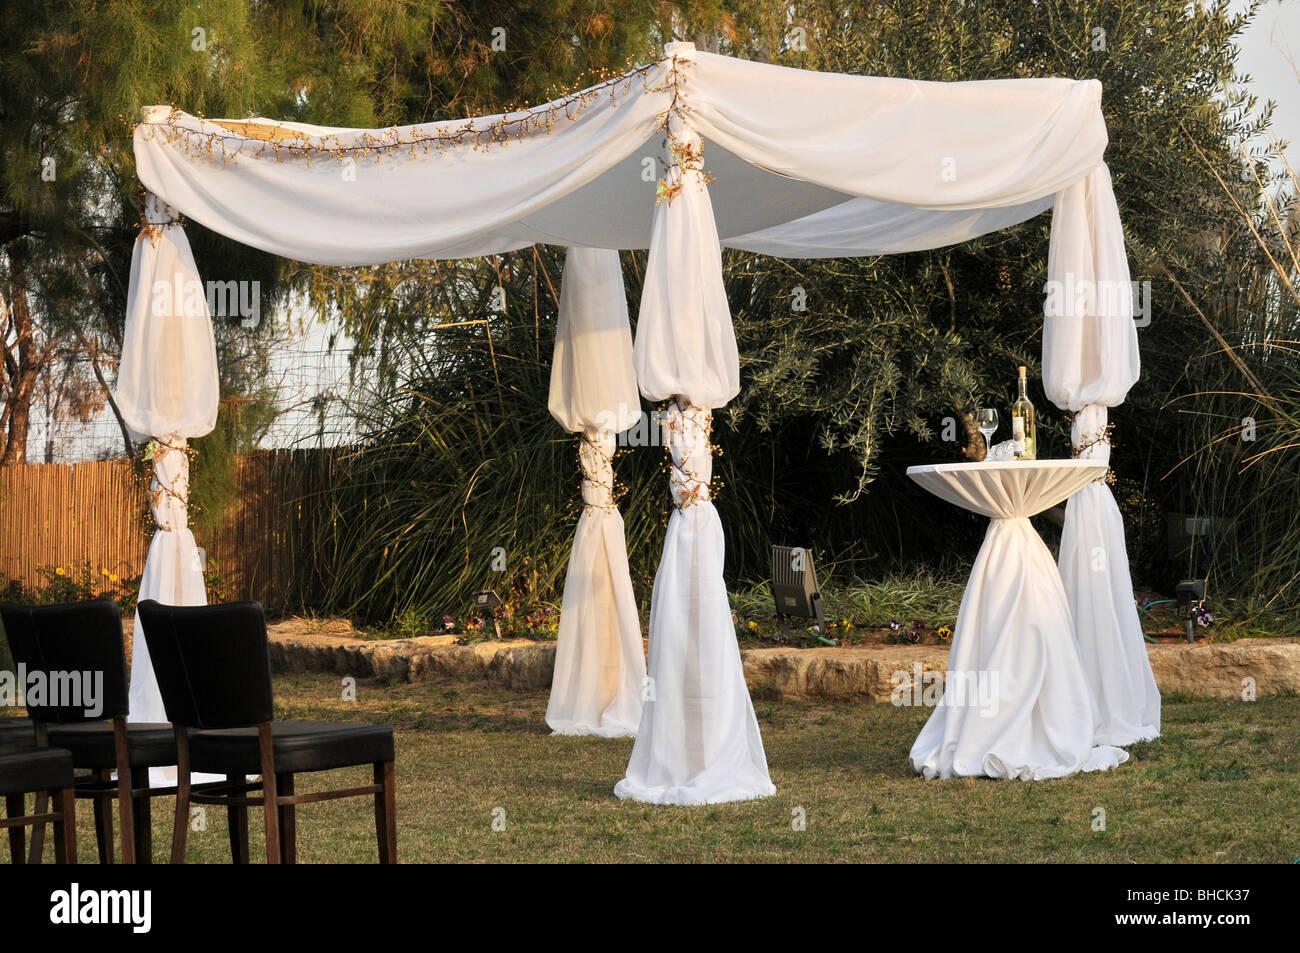 The Jewish wedding canopy A chuppah & The Jewish wedding canopy A chuppah Stock Photo: 27937931 - Alamy